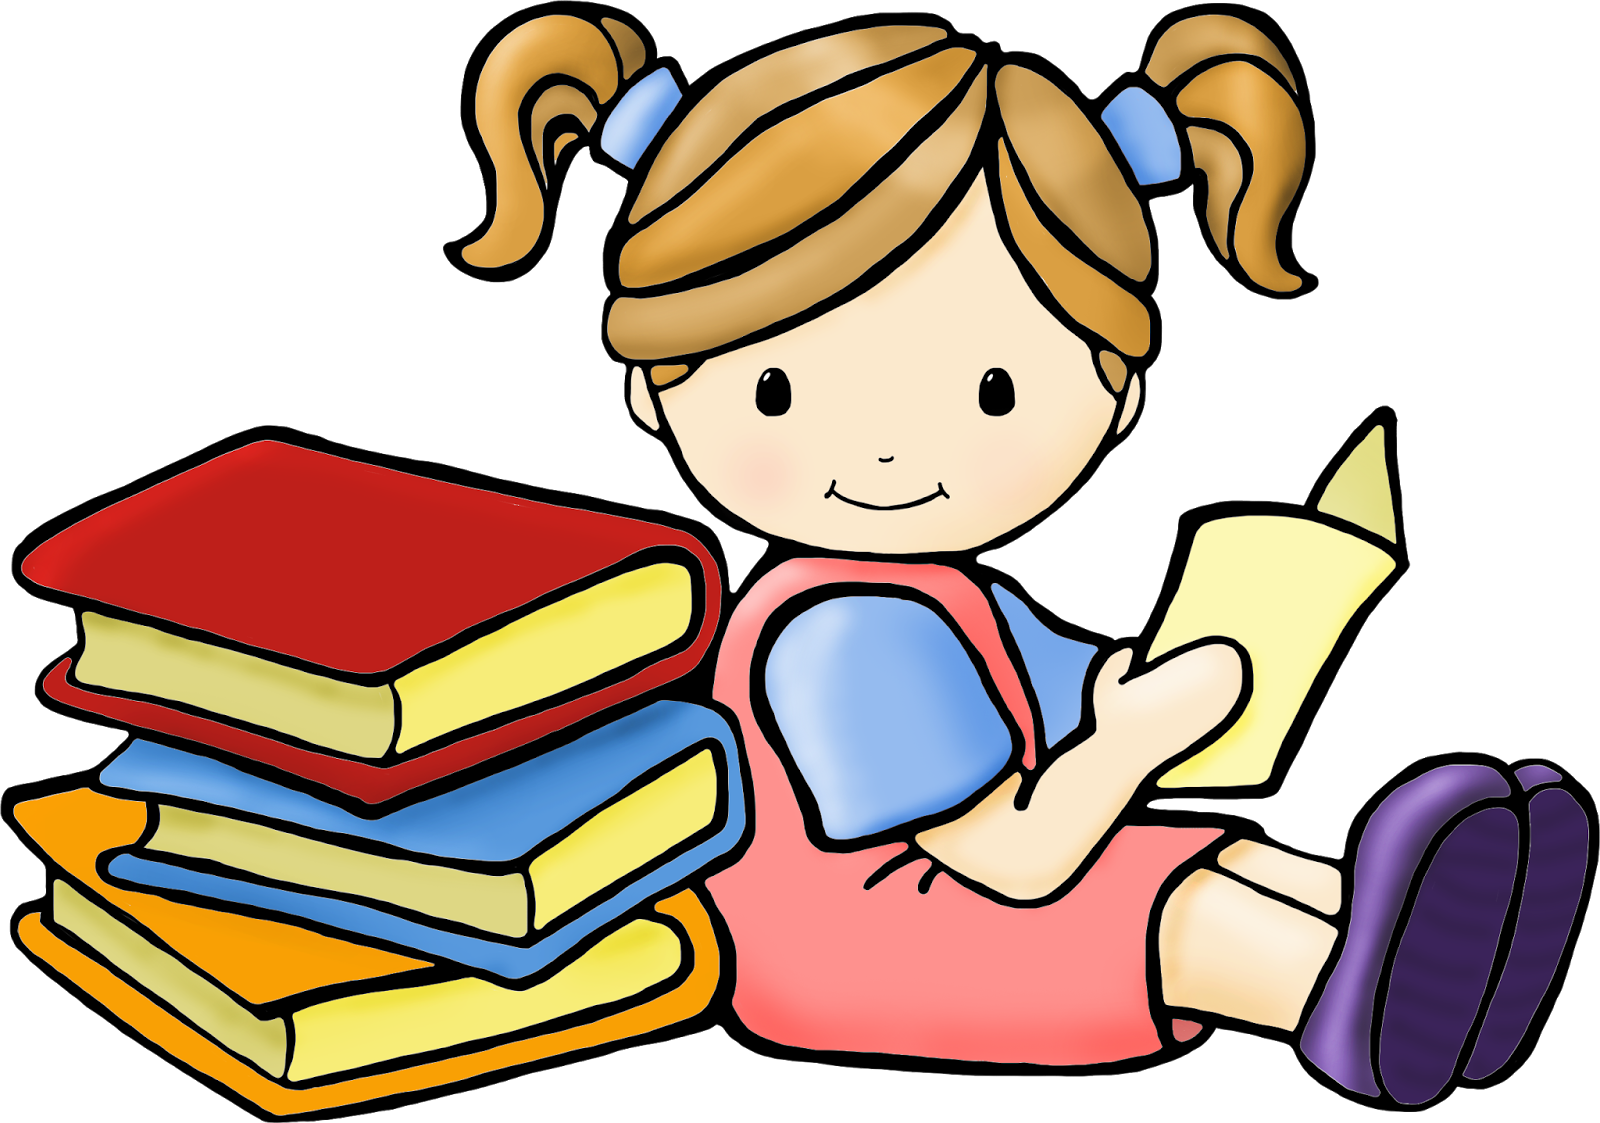 Stick Kids Reading Clipart. Follow us.-Stick Kids Reading Clipart. Follow us.-12